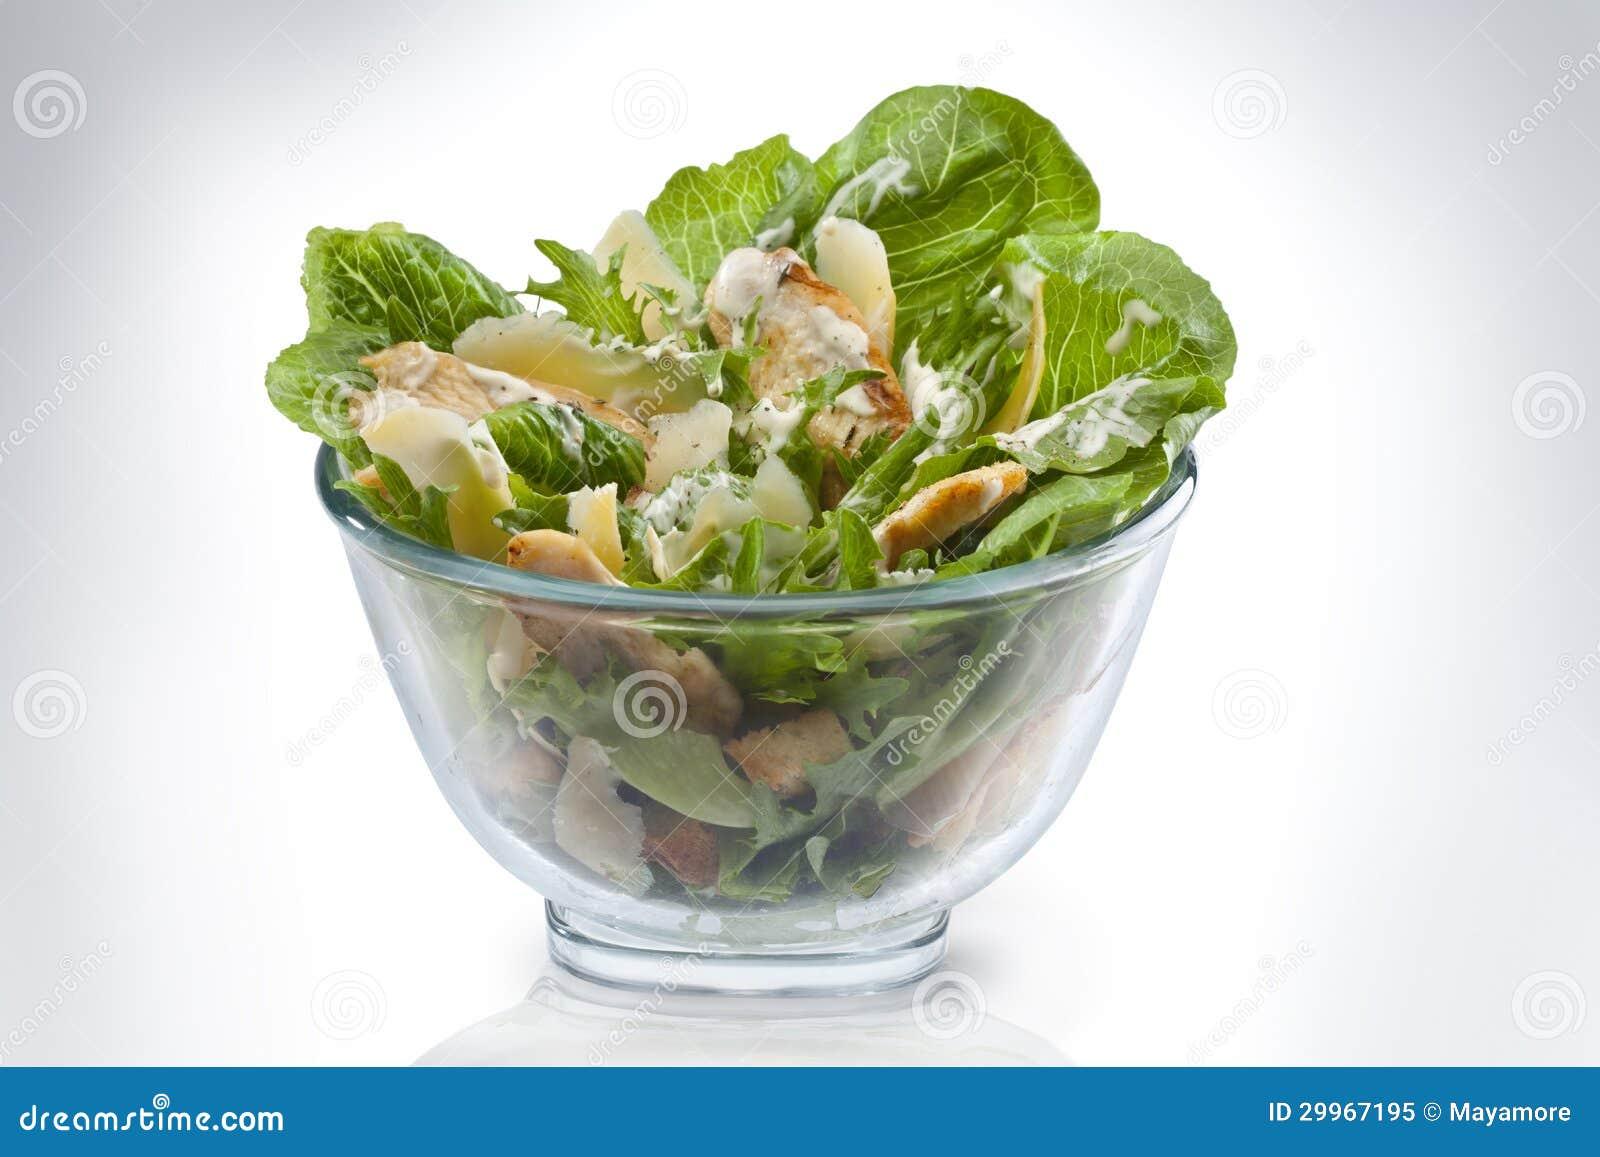 how to prepare a caesar salad